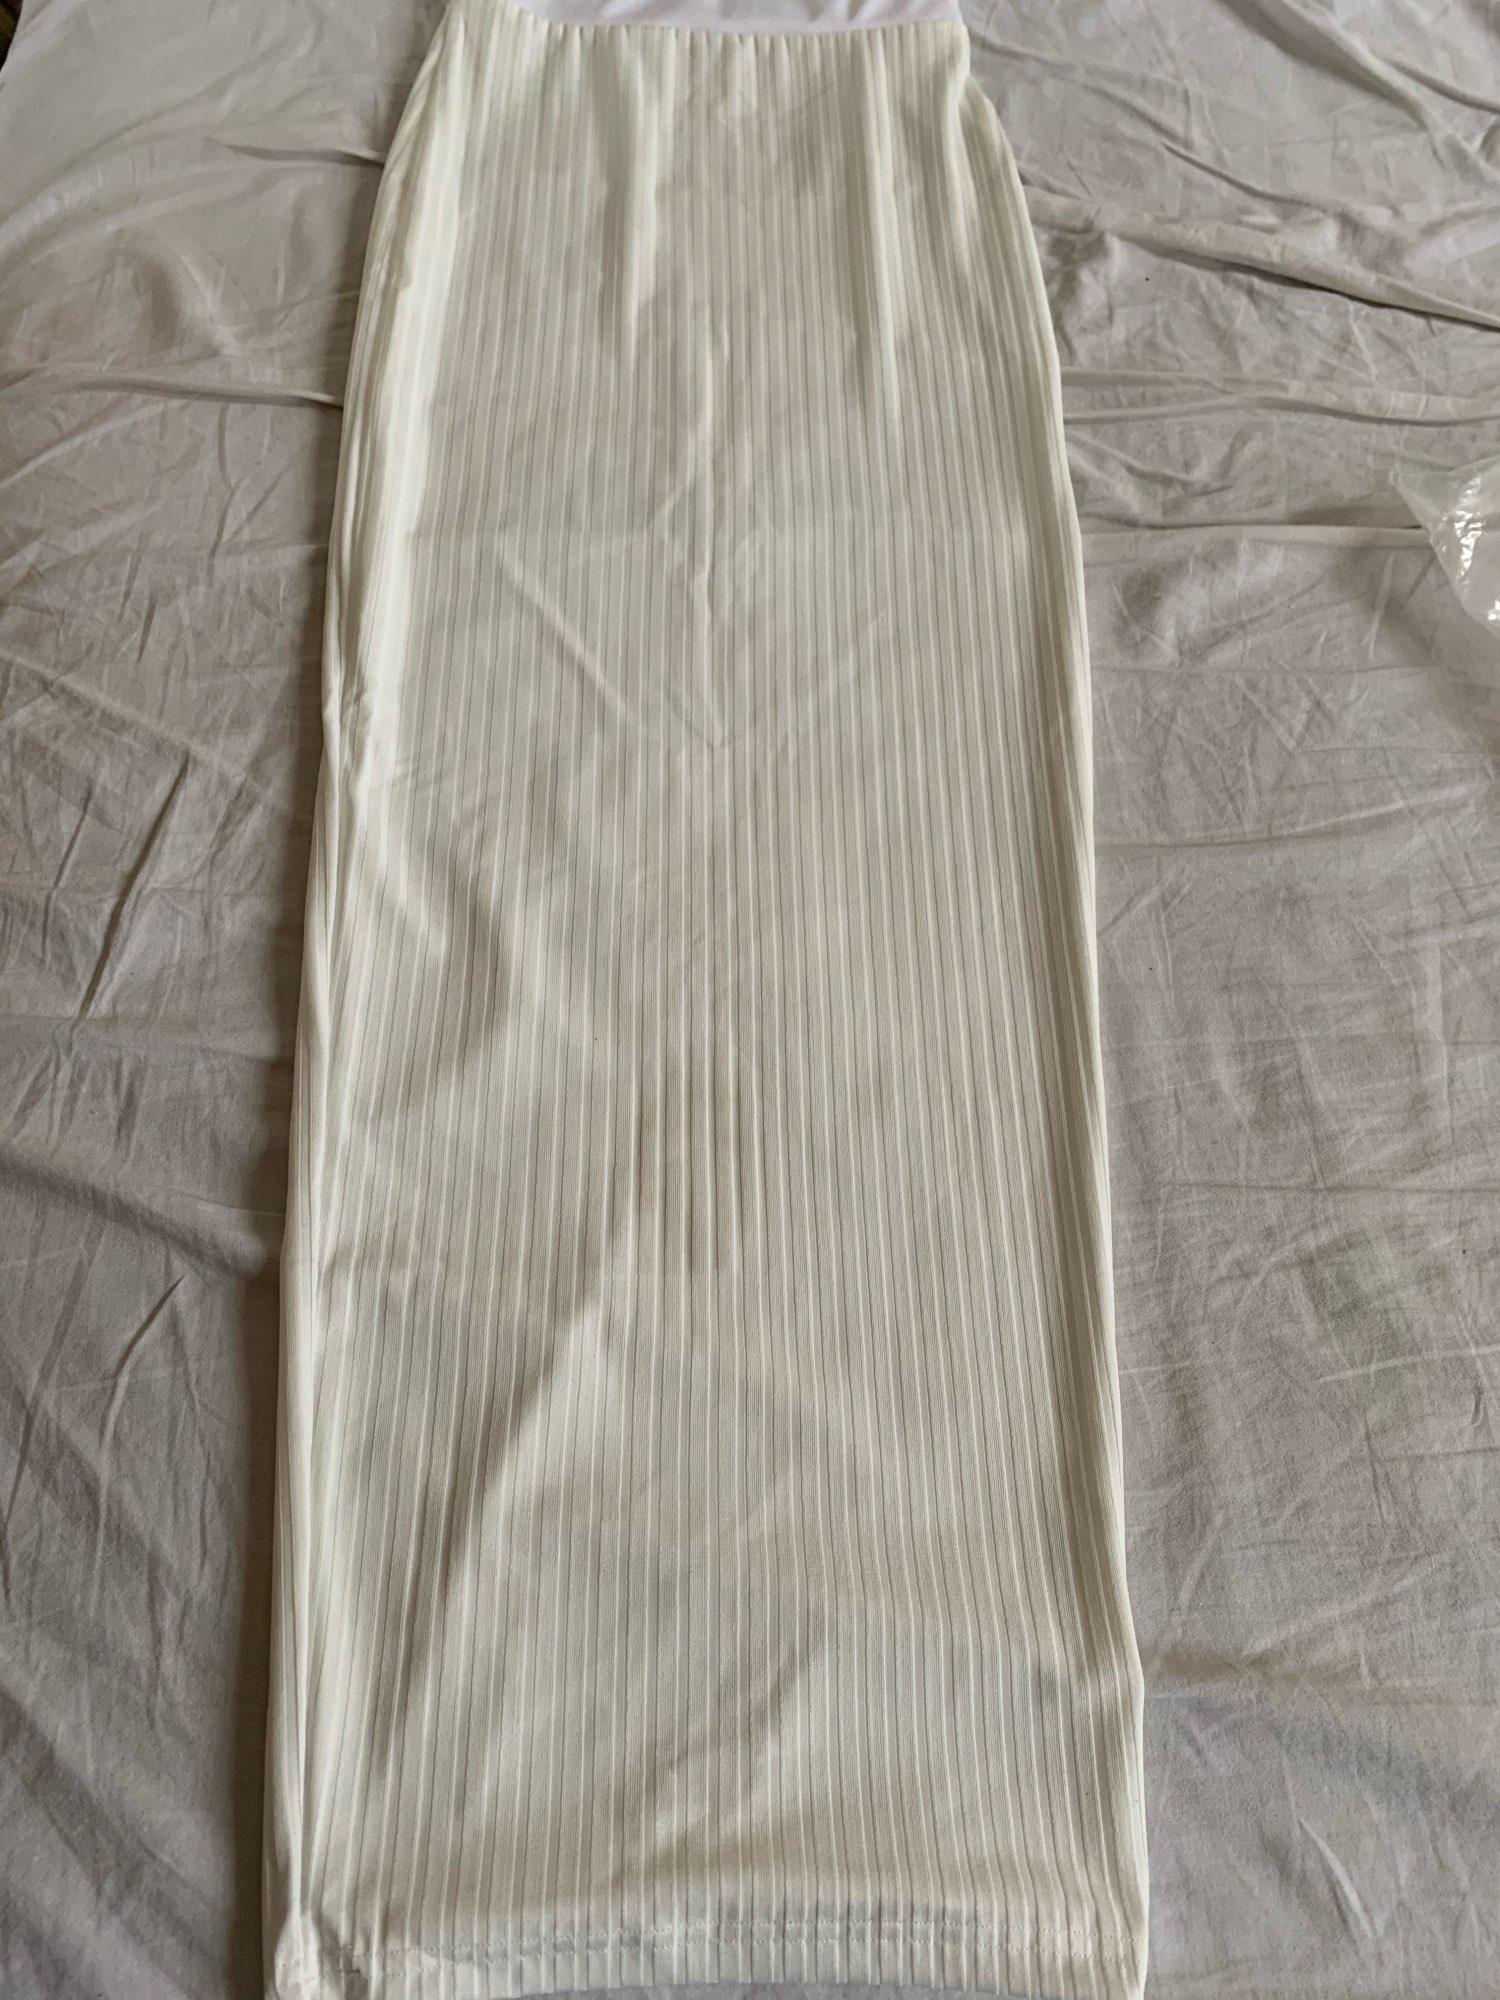 Articat Halter Backless Sexy Knitted Pencil Dress Women White Off Shoulder Long Bodycon Party Dress Elegant Summer Dress 2020 reviews №1 485504